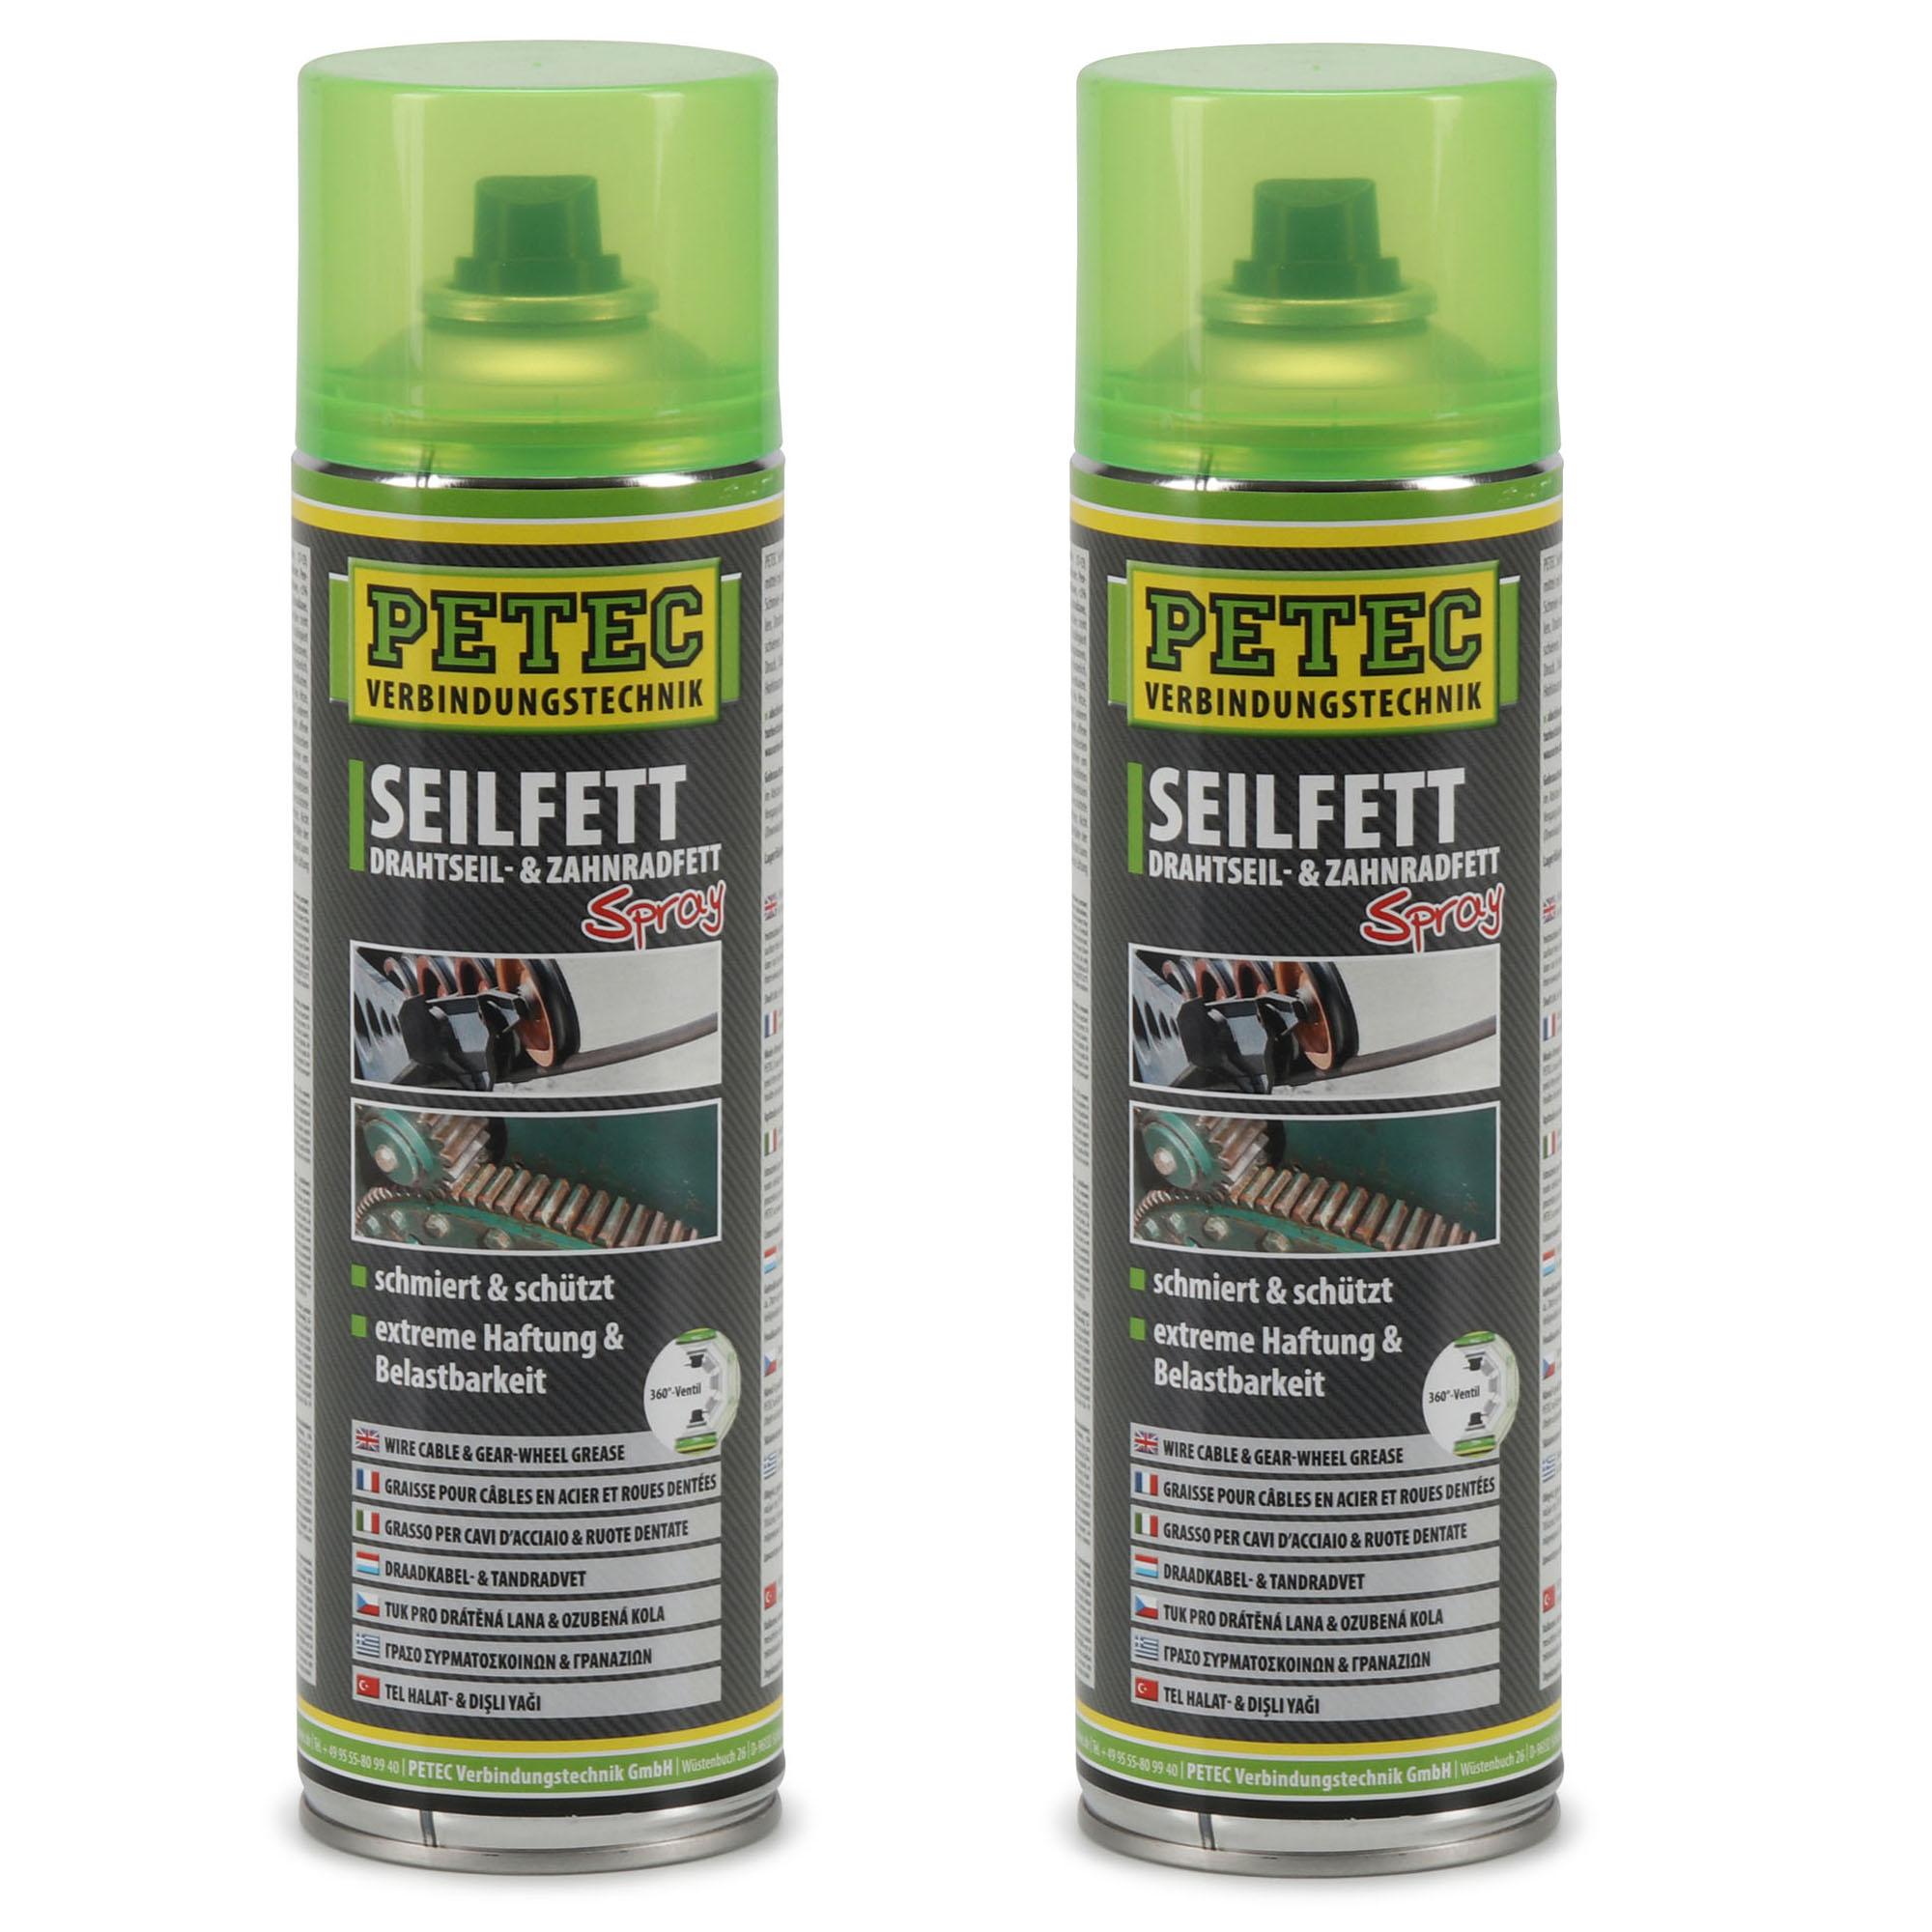 PETEC 71650 Seilfett Seilfettspray Drahtseilfett Zahnradfett Fettspray 2x 500ml